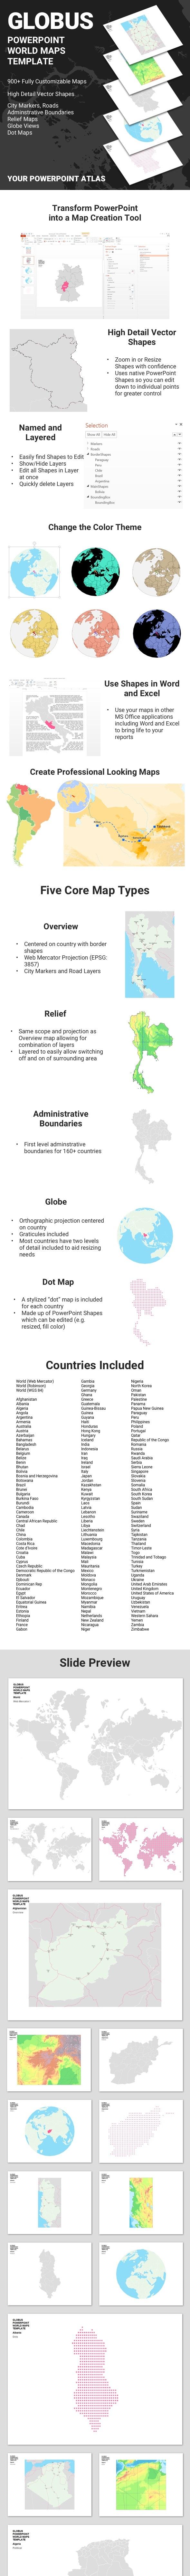 GLOBUS - PowerPoint Maps Template - Miscellaneous PowerPoint Templates